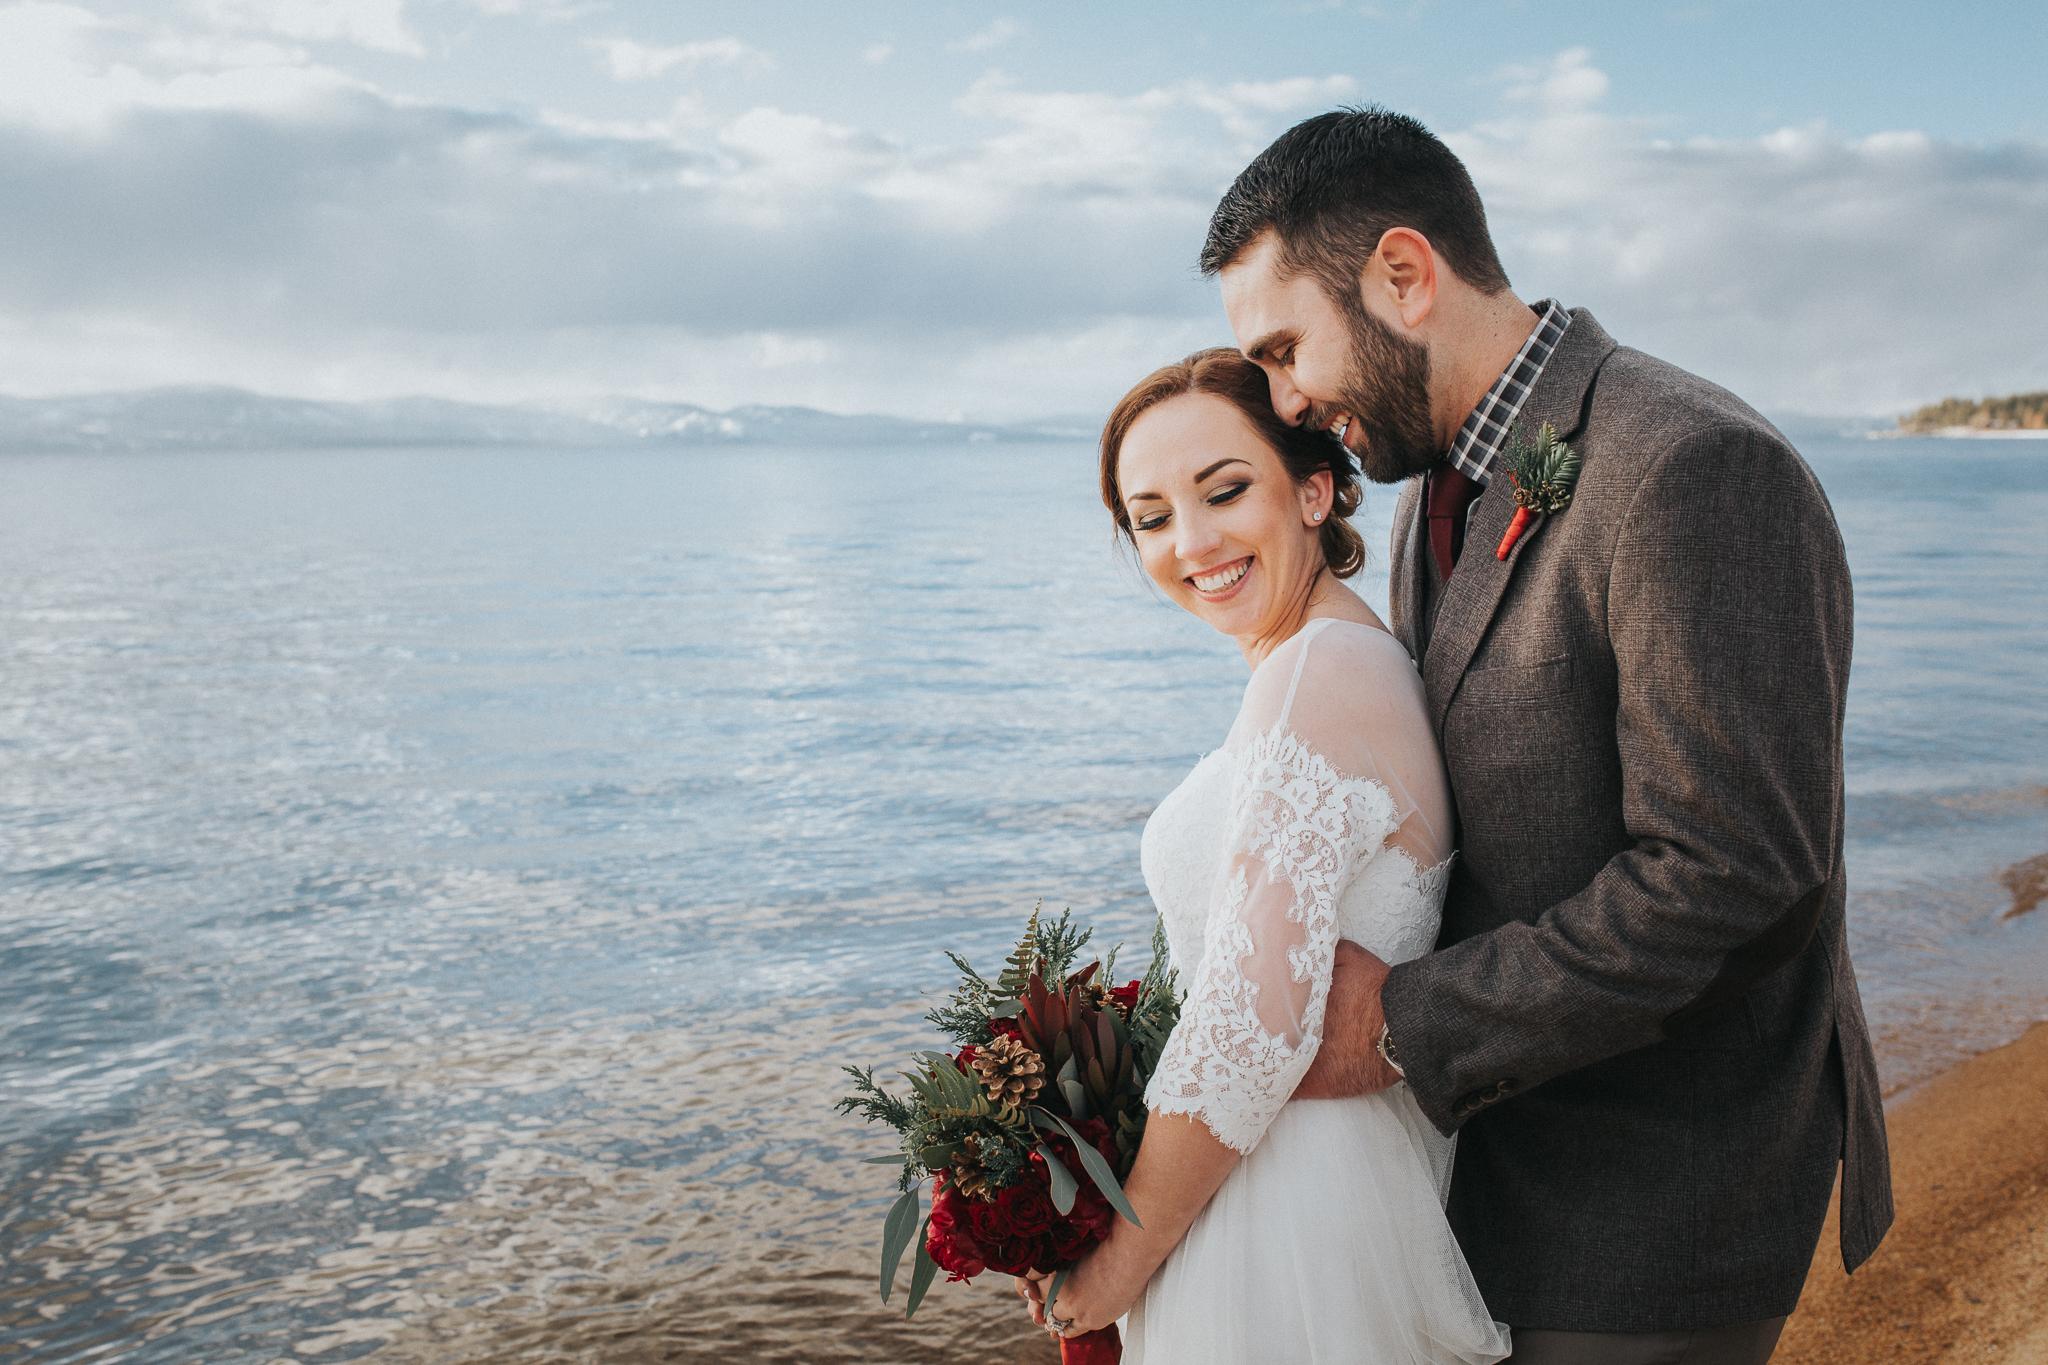 winter-wedding-reno-lake-tahoe-wedding-photographer-09.jpg